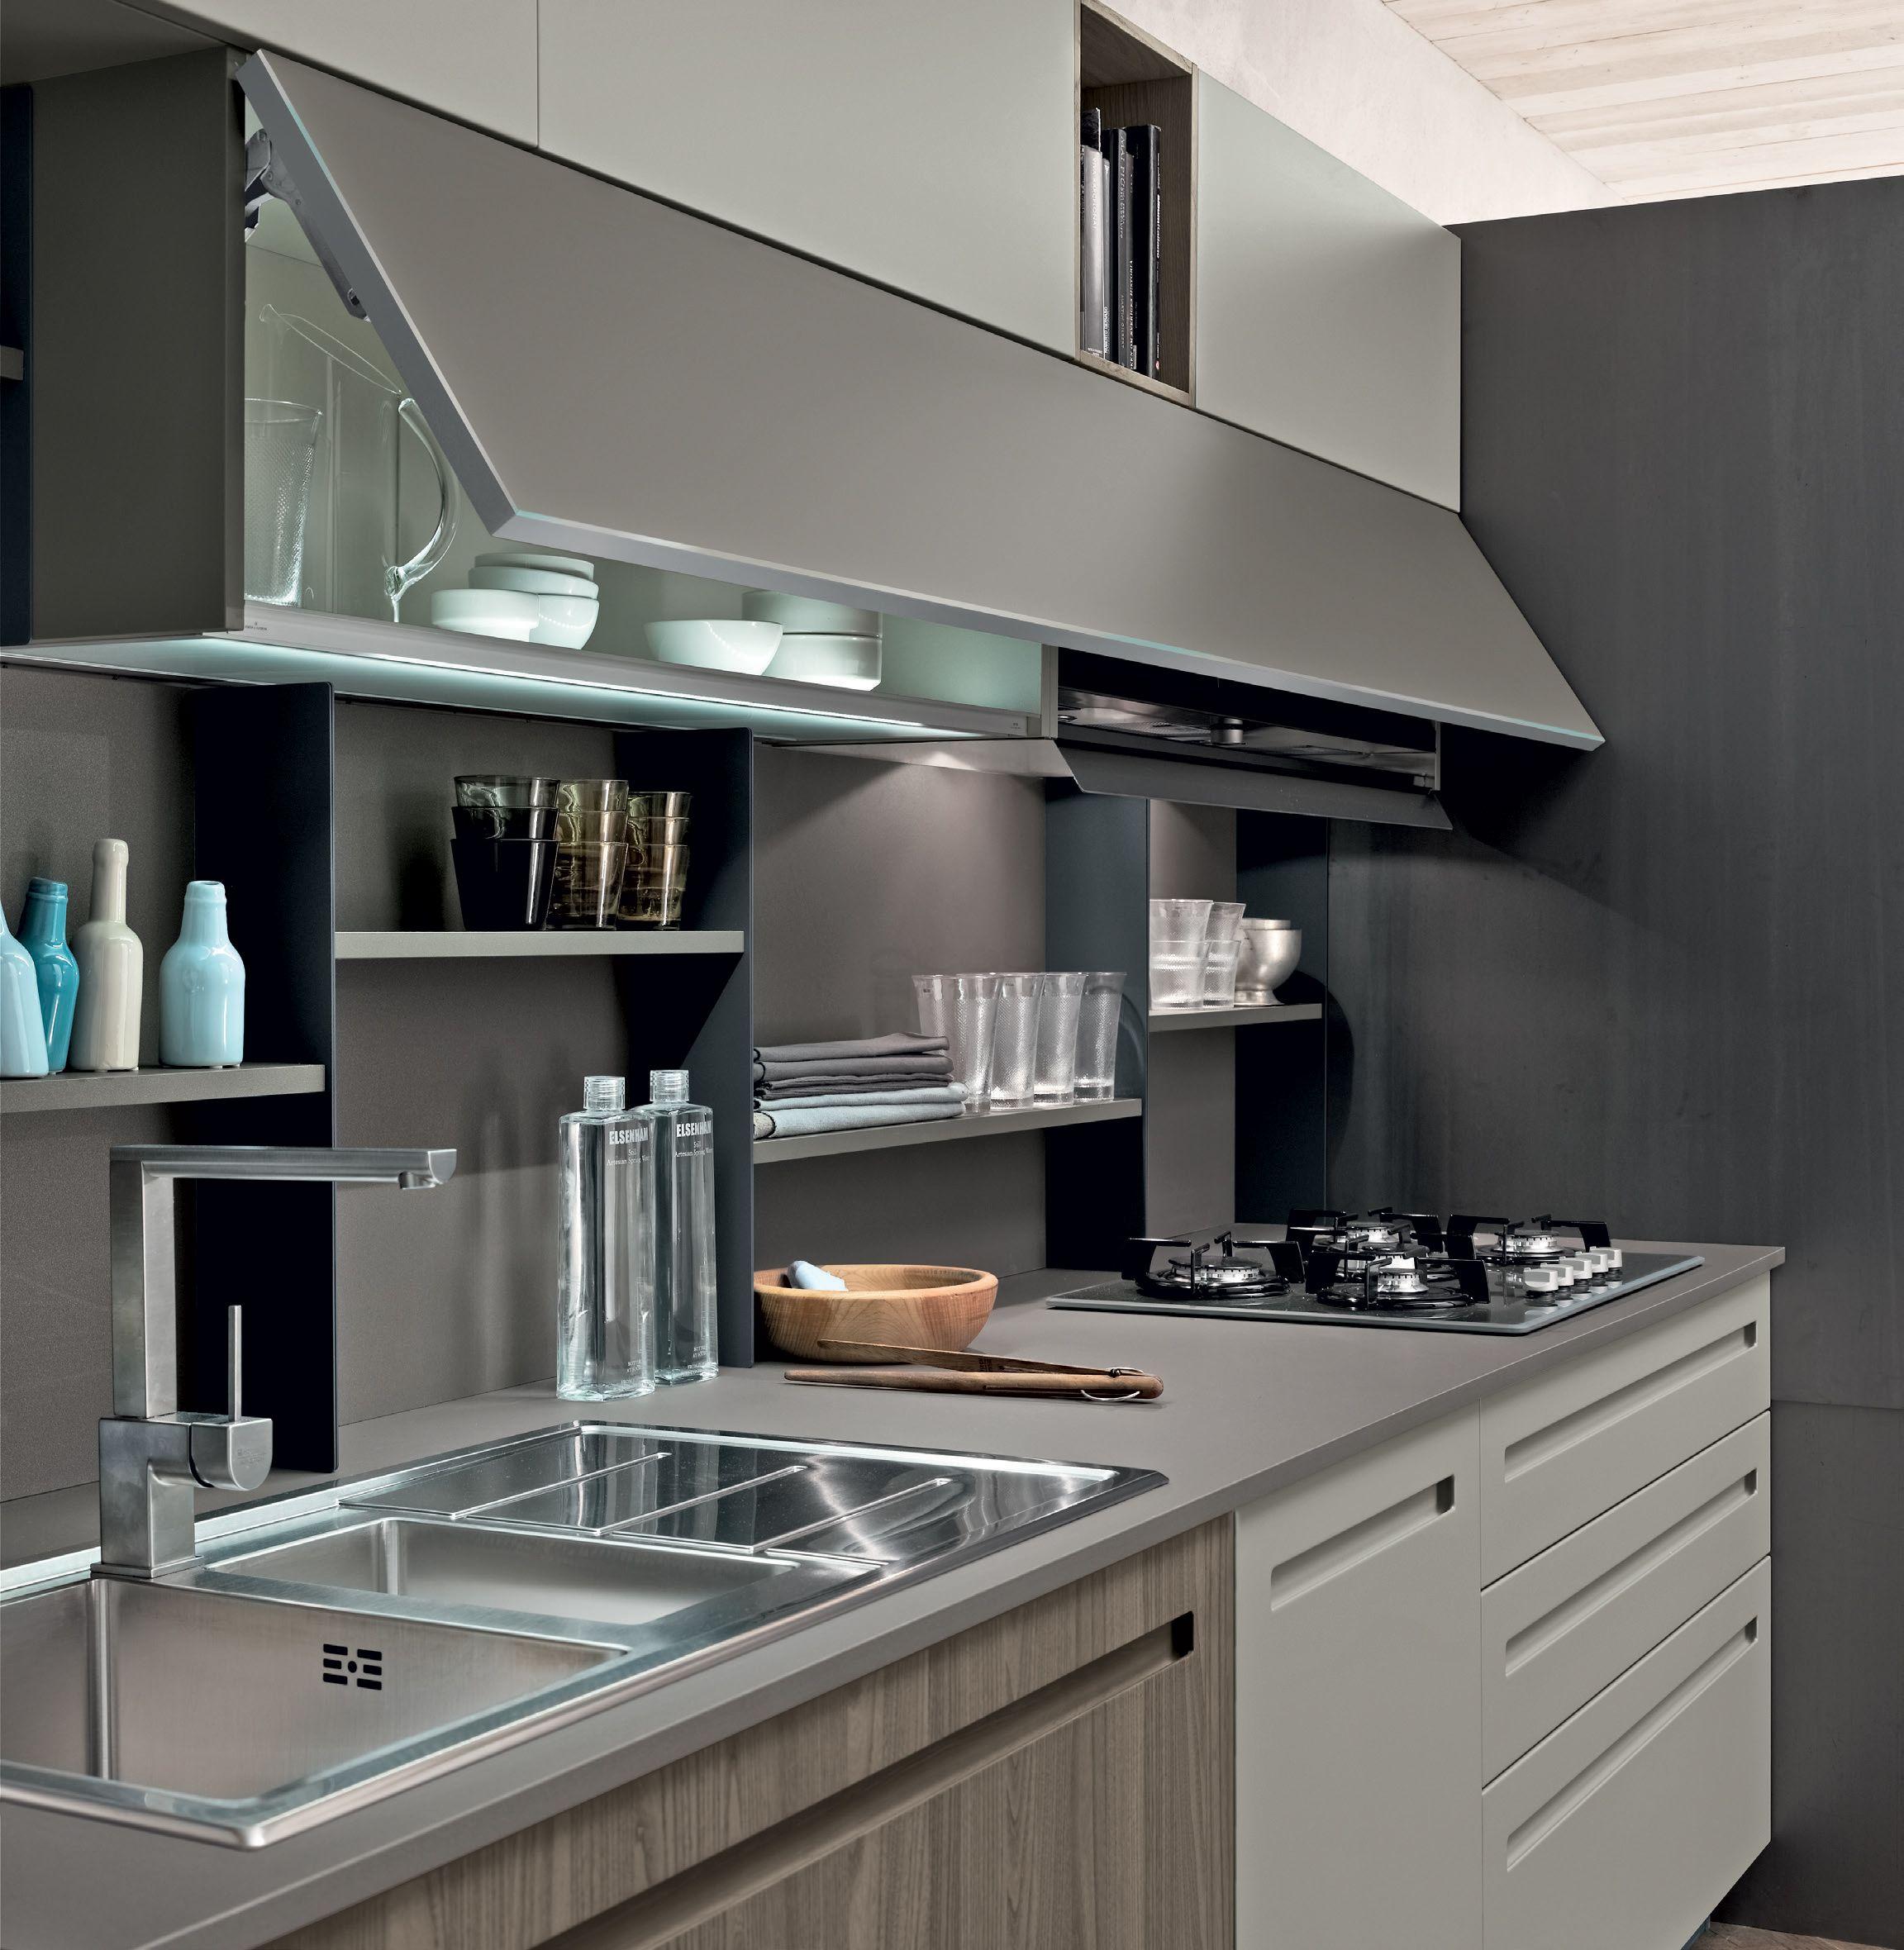 Modelli Cucine Moderne Stosa.Stosa Cucine Arredamento Per Modelli Di Cucine Moderne Mood